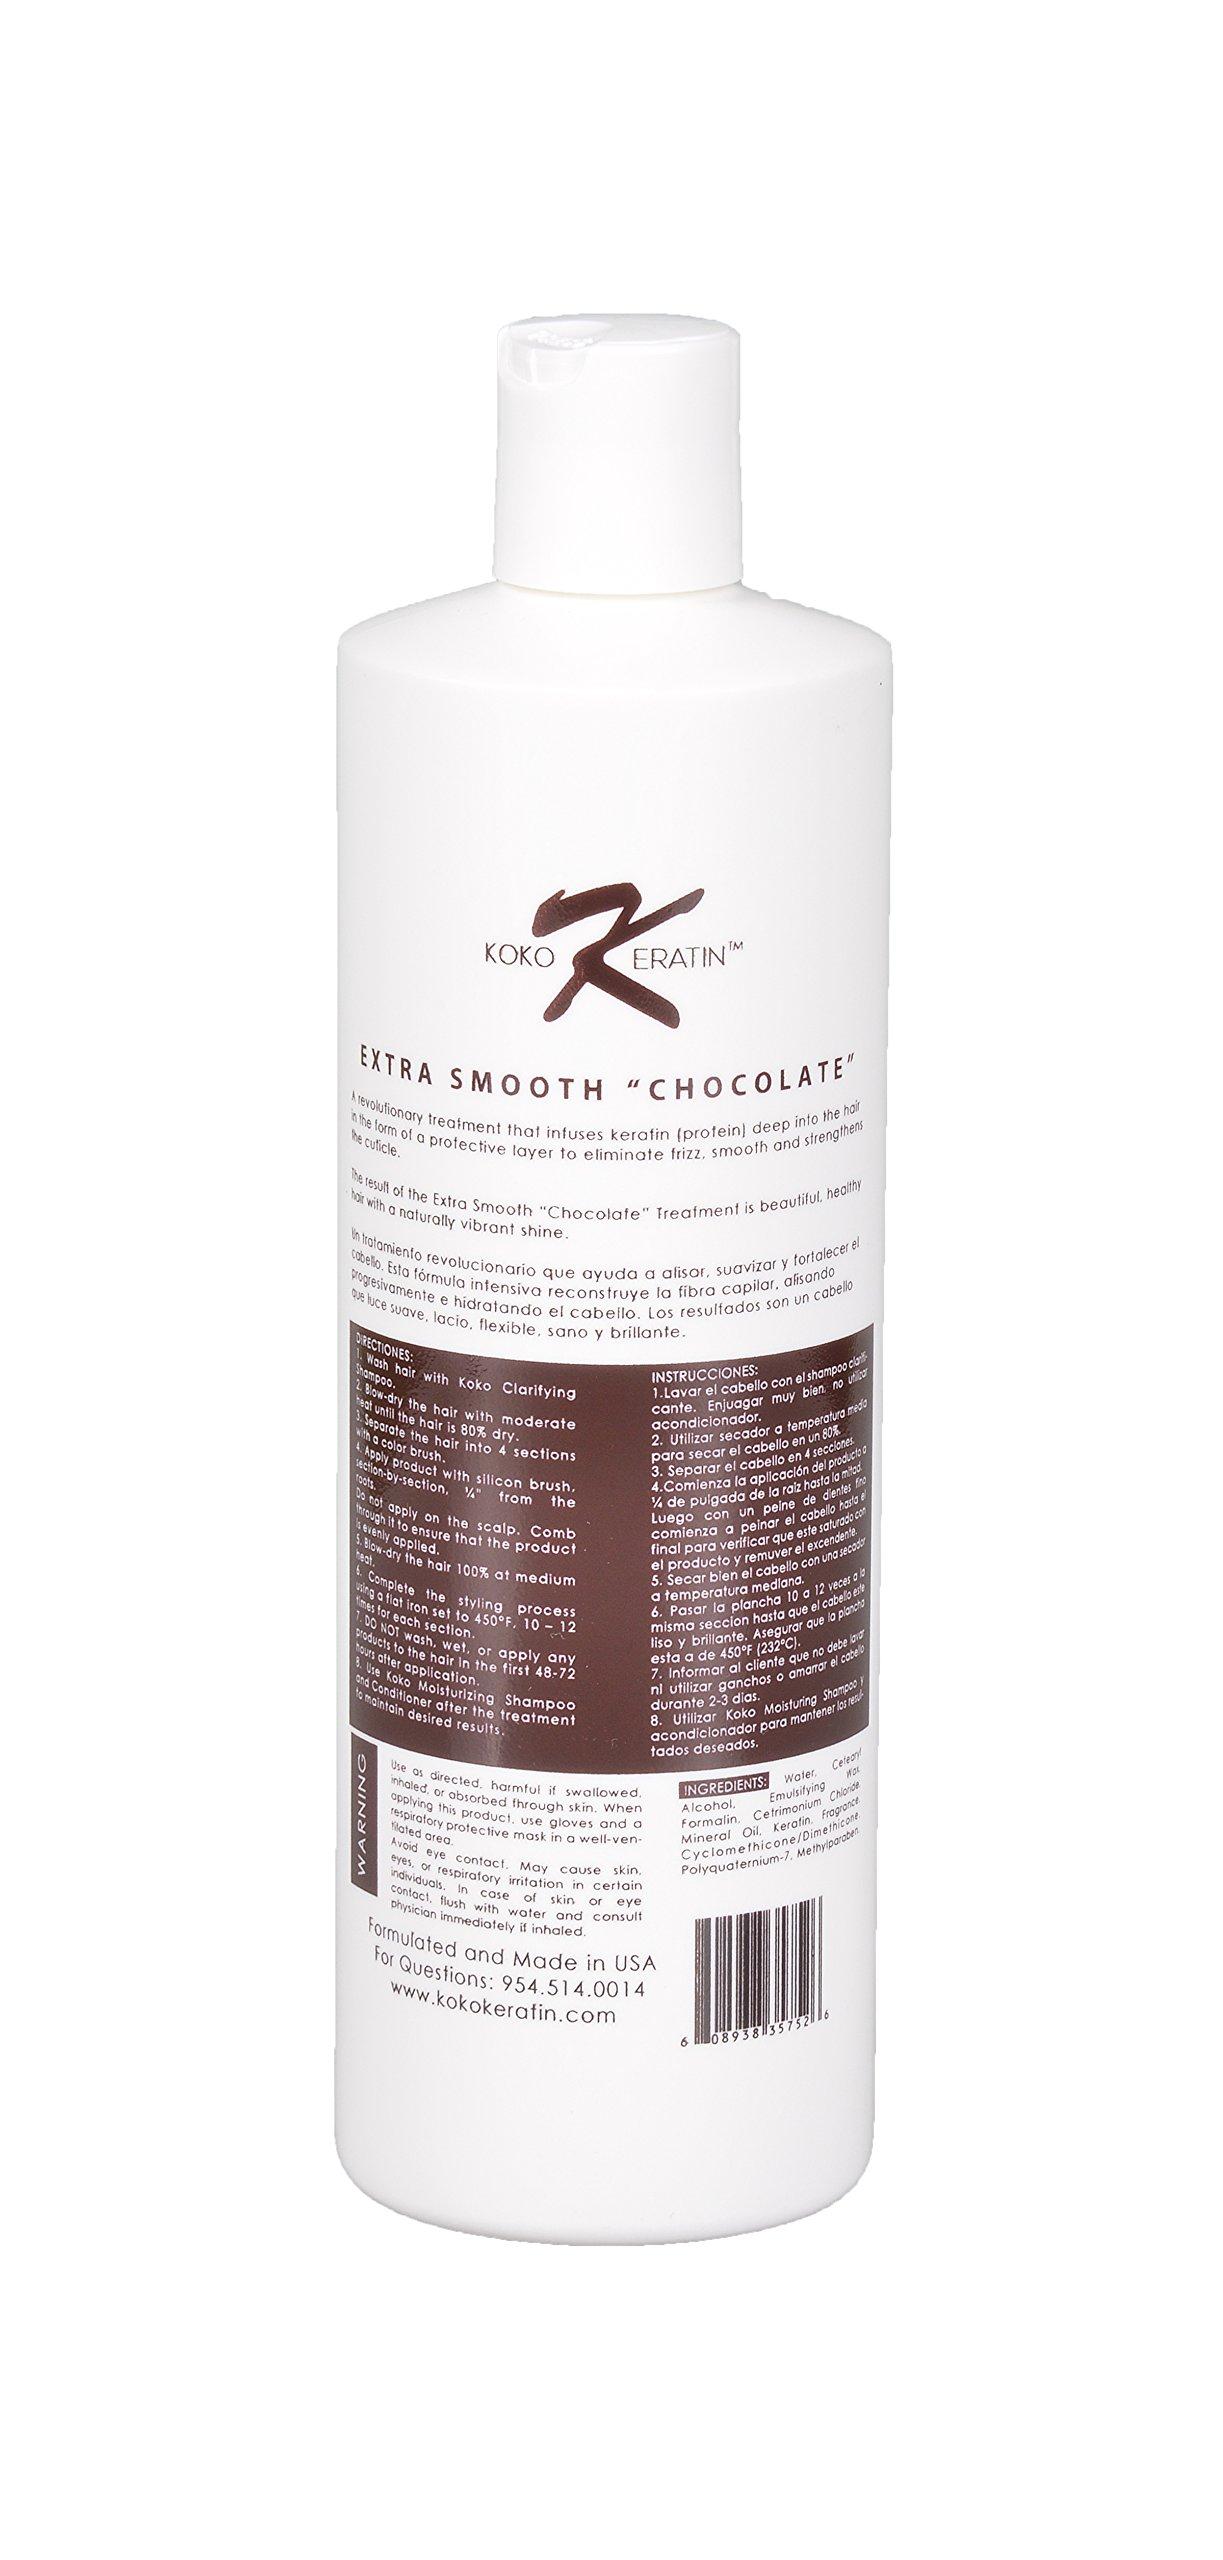 Brazilian Keratin Treatment Chocolate For Professional Use 16 Oz SUPER SMOOTHING, STRAIGHTENING, ADD VOLUME, ADD SHINE,ELIMINATE FRIZZ, PROTECTS HAIR. by KOKO KERATIN (Image #2)